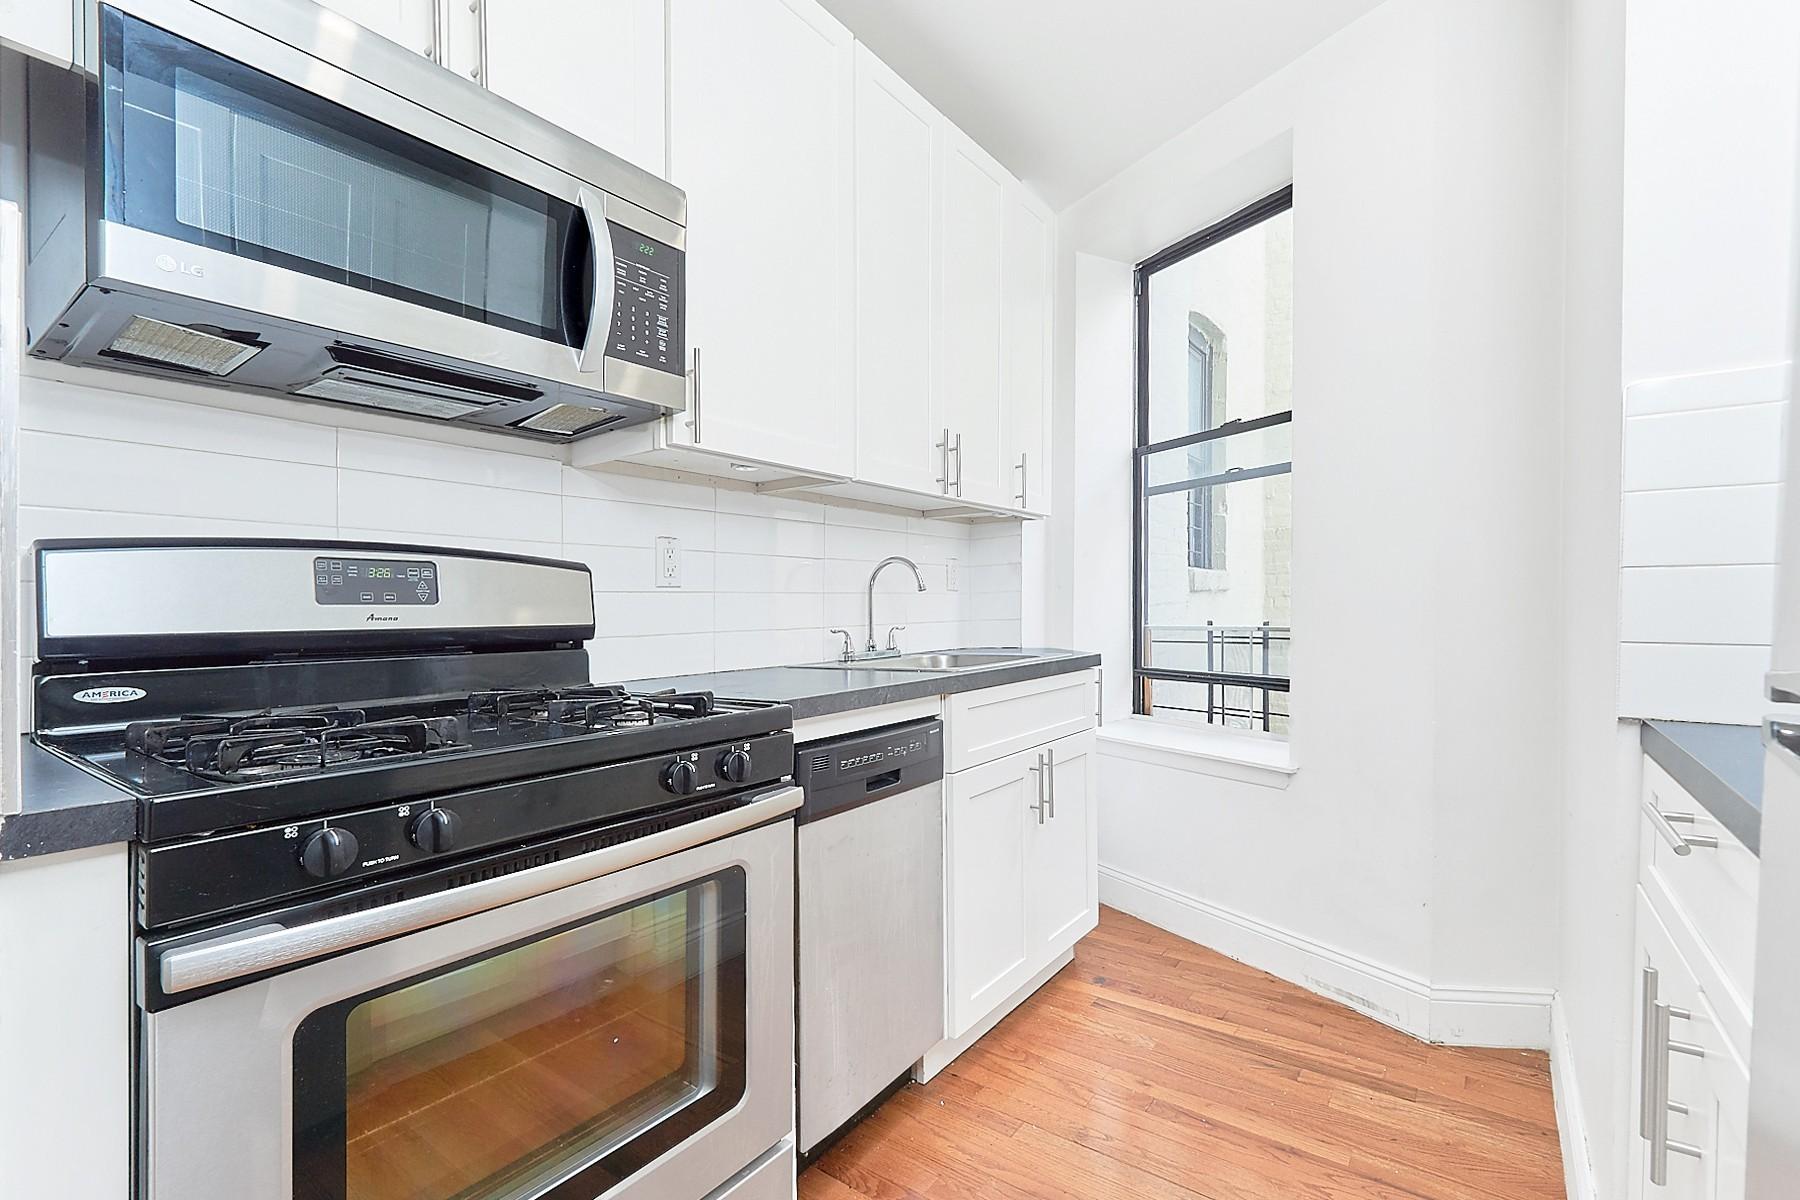 125 West 116th Street, Apt 5C, Manhattan, New York 10026